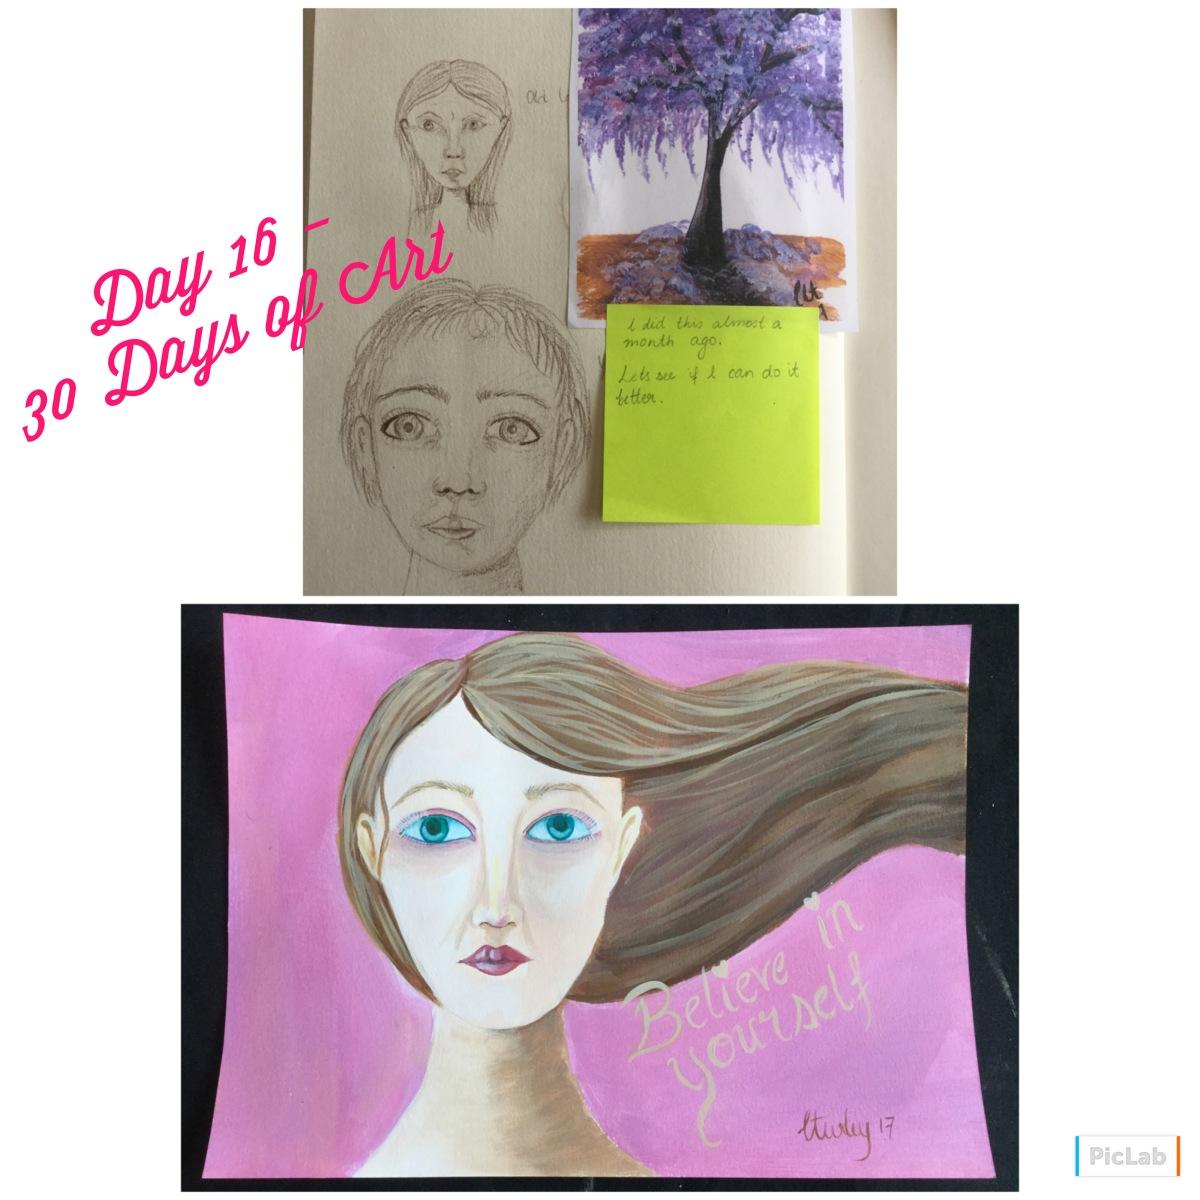 Day 16 – 30 Days ofArt